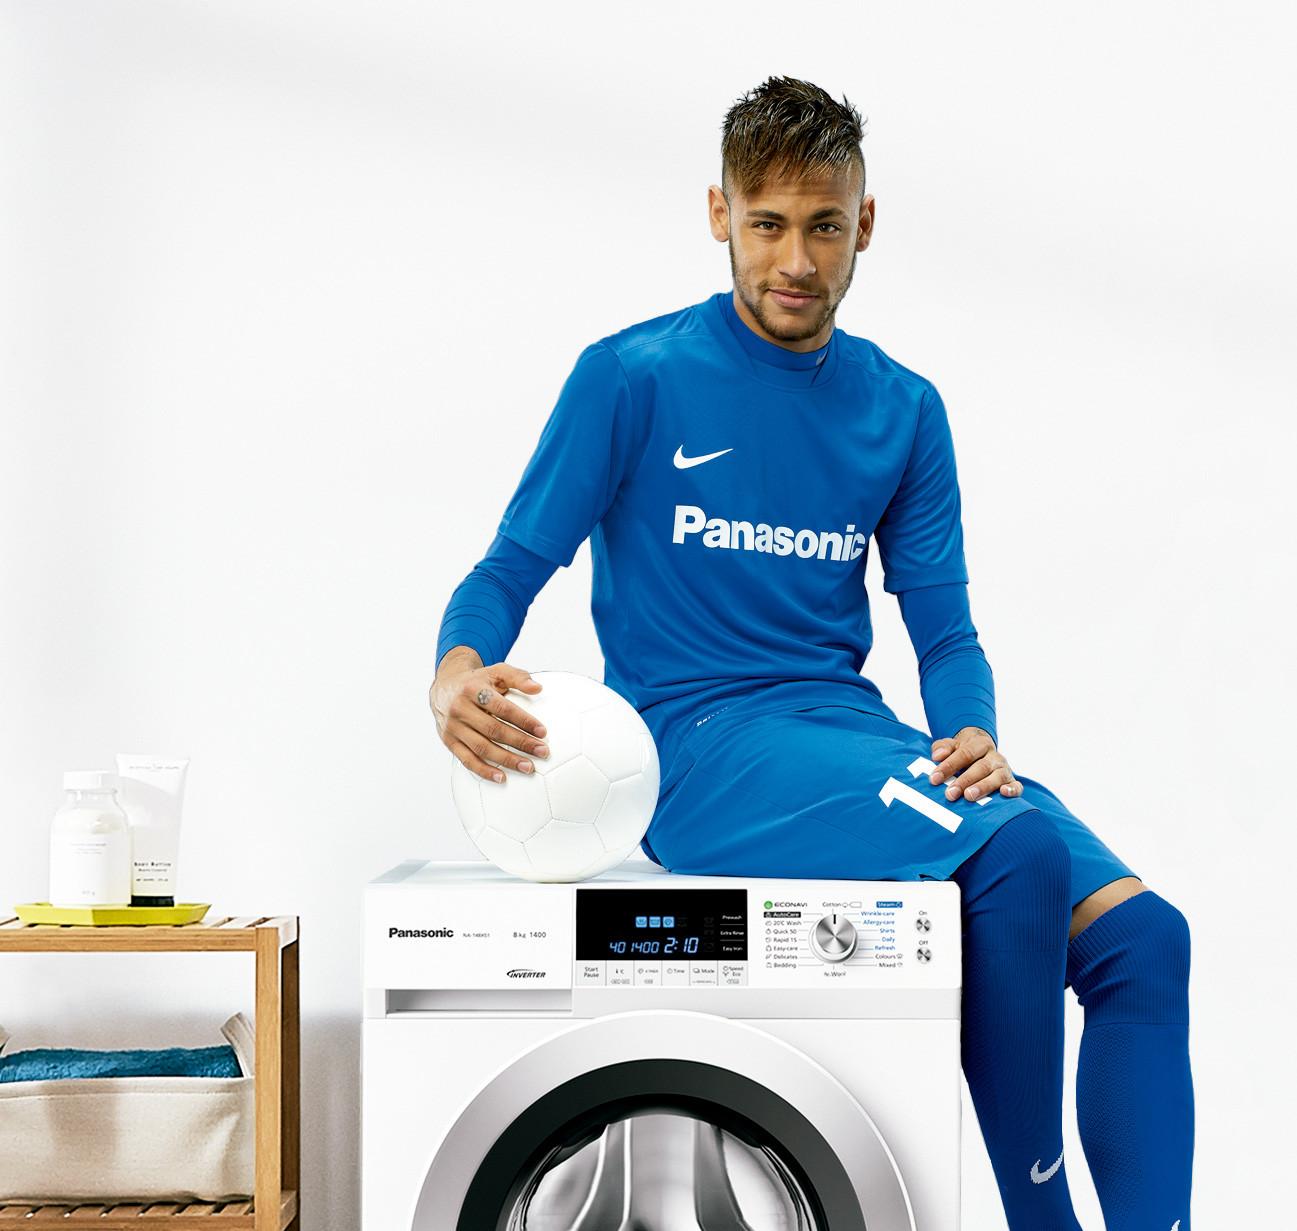 A champion performance in pristine laundry care